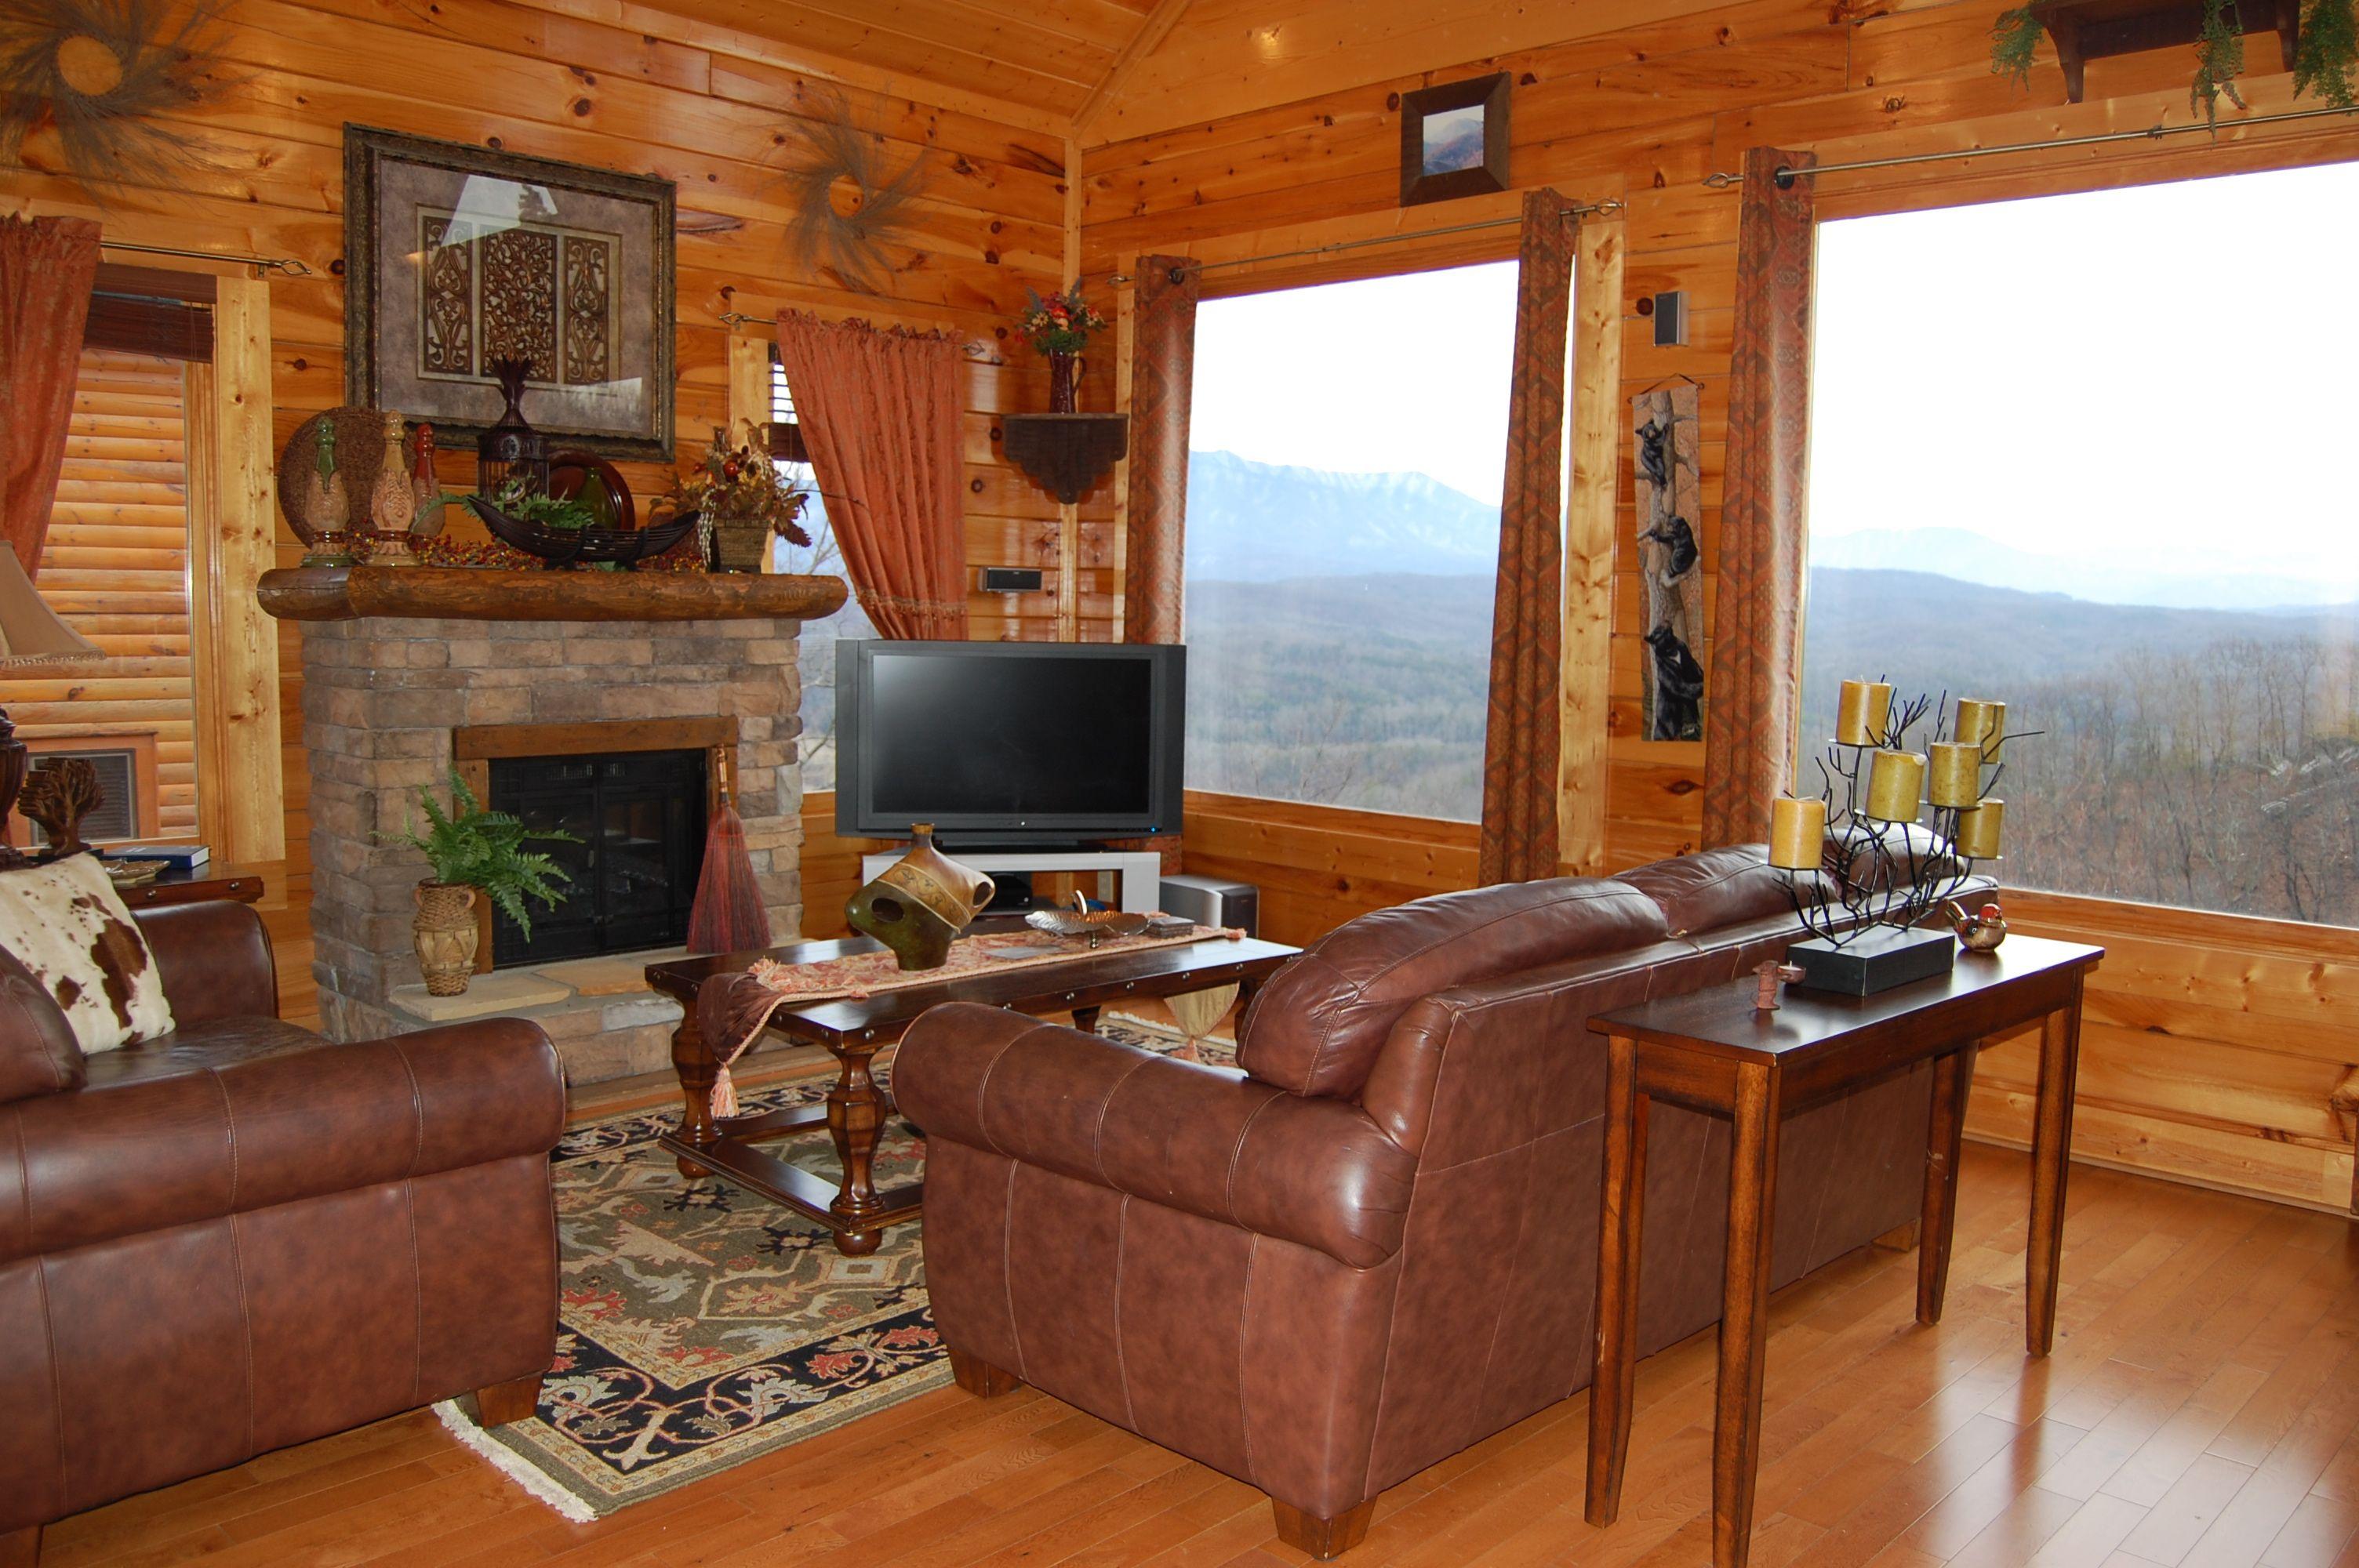 Aloft The Smokies Sevierville Cabins Sleeps 7 12 Tracy Kirk